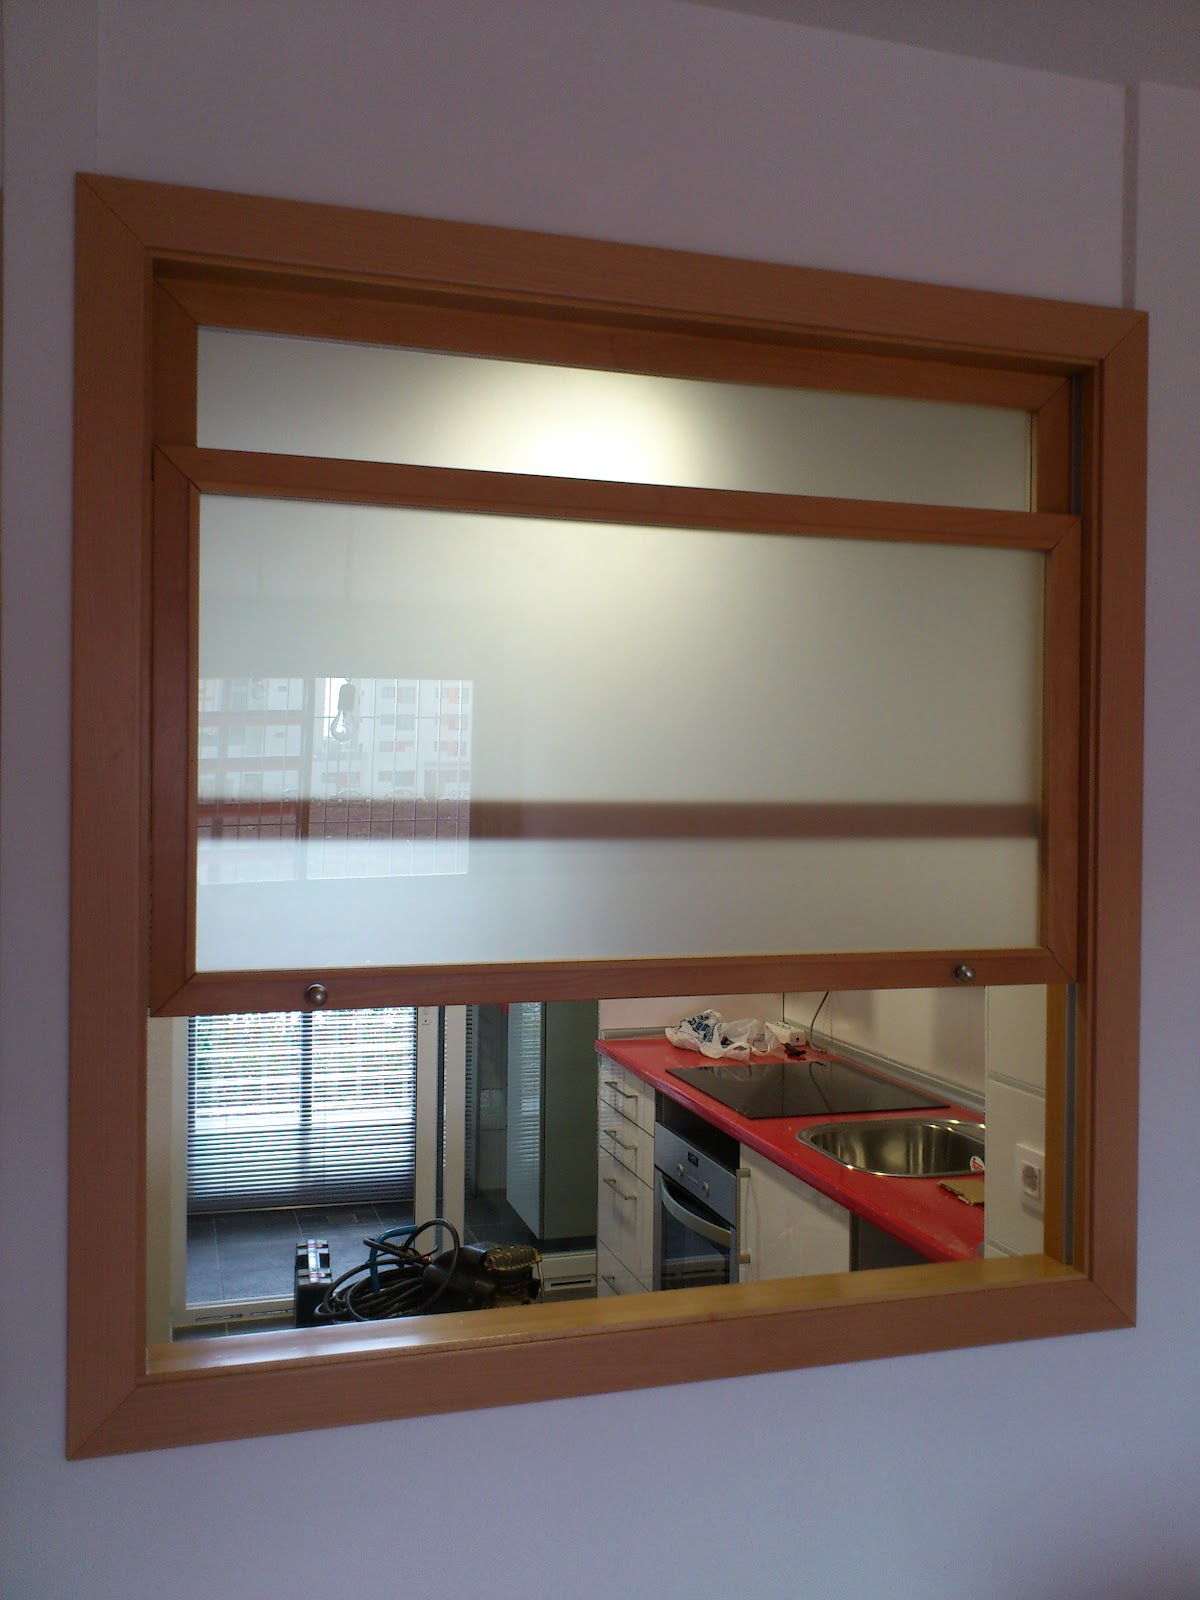 Muebles a medida ventana de guillotina entre cocina y salon for Muebles a medida de cocina